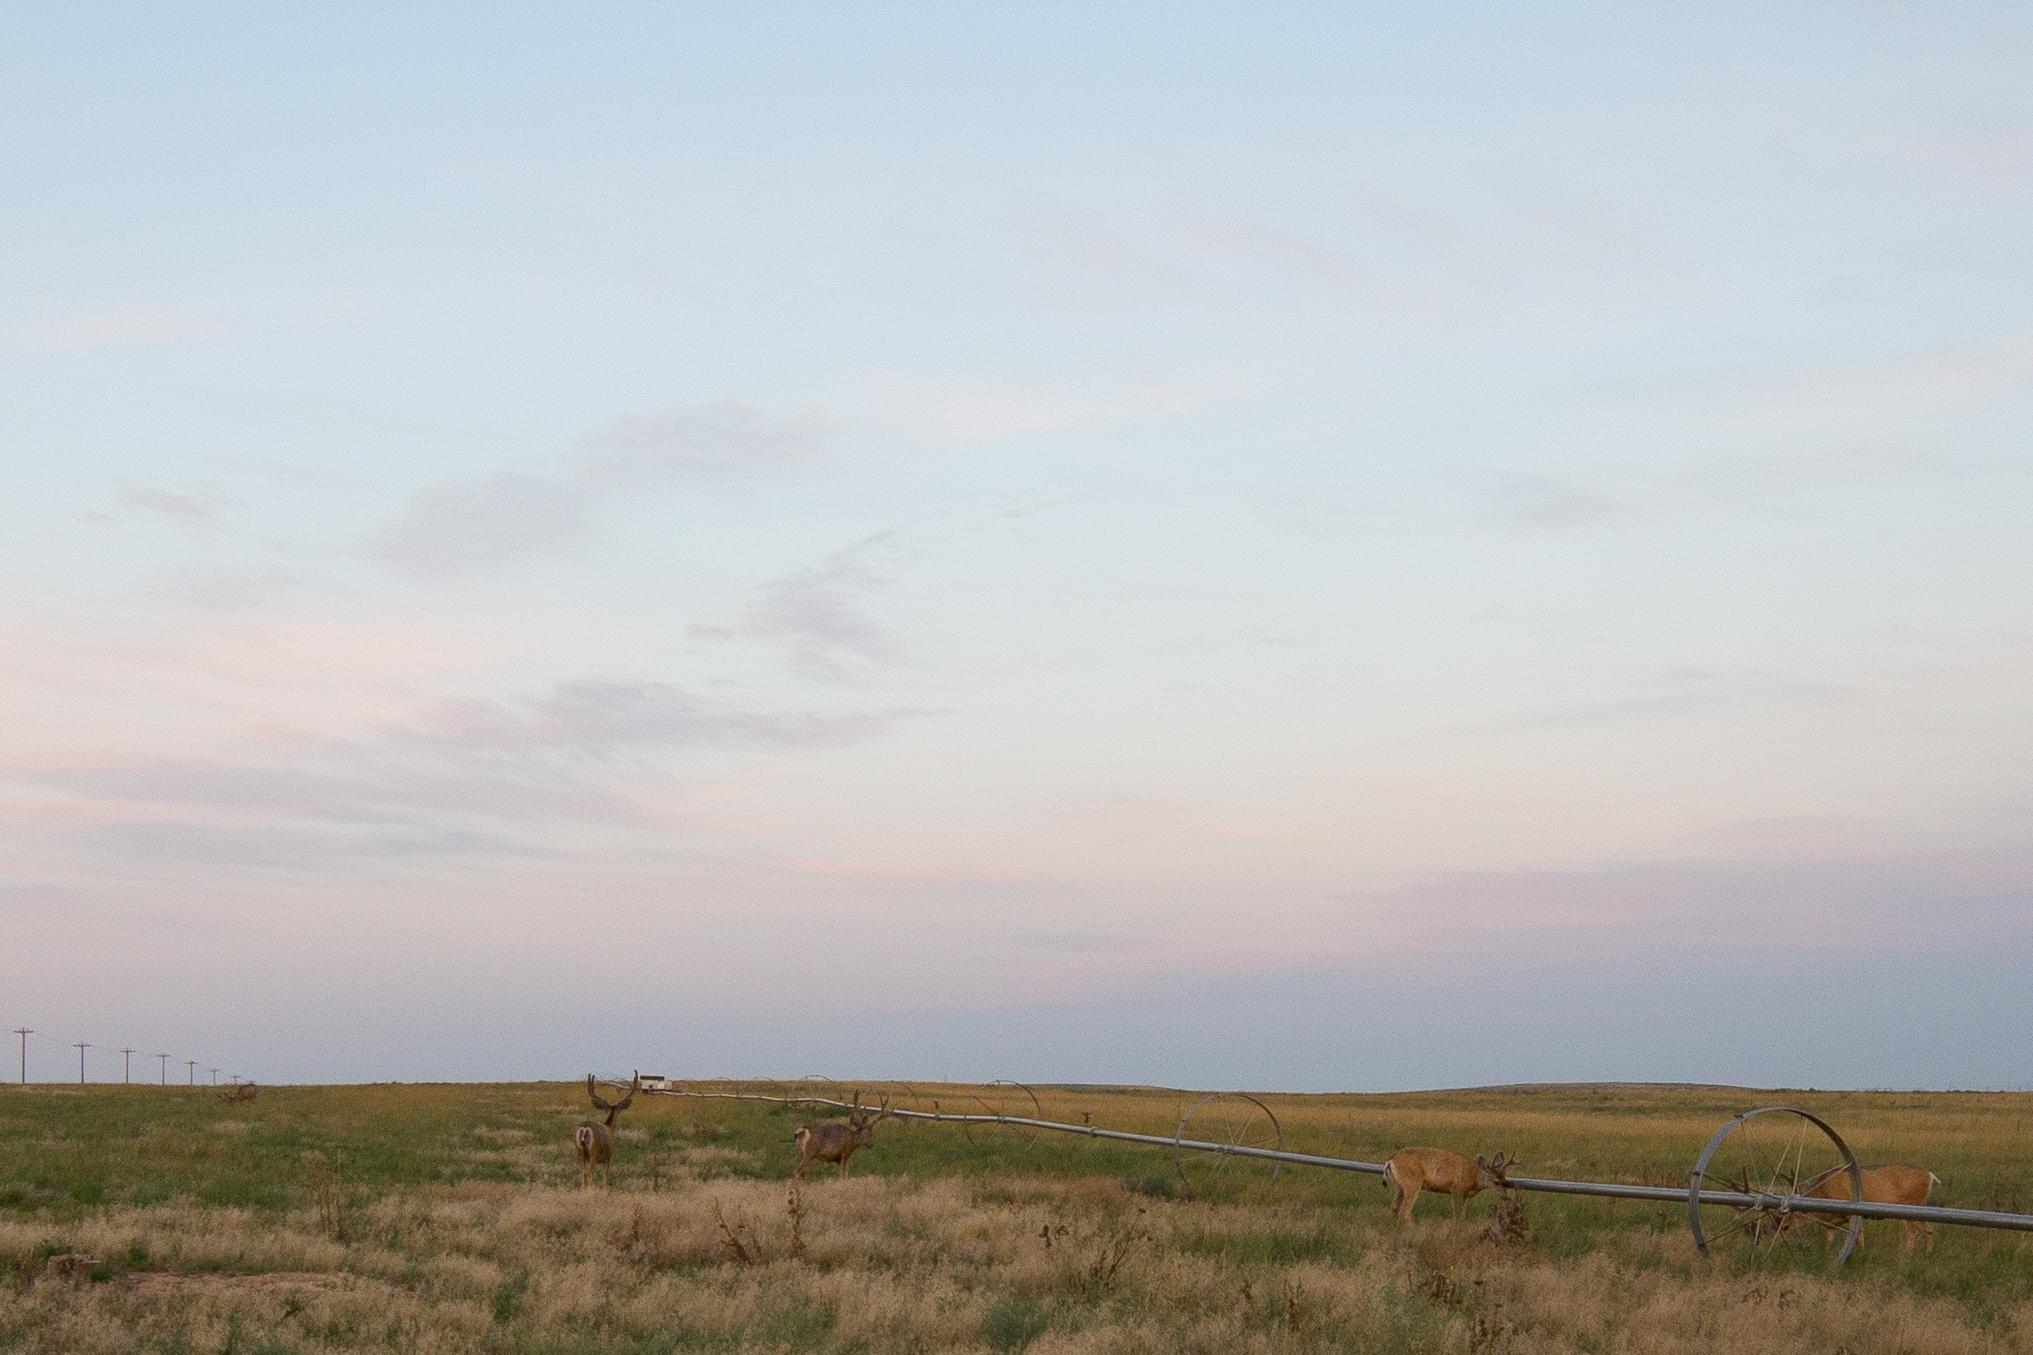 Rocky Mountain Arsenal National Park